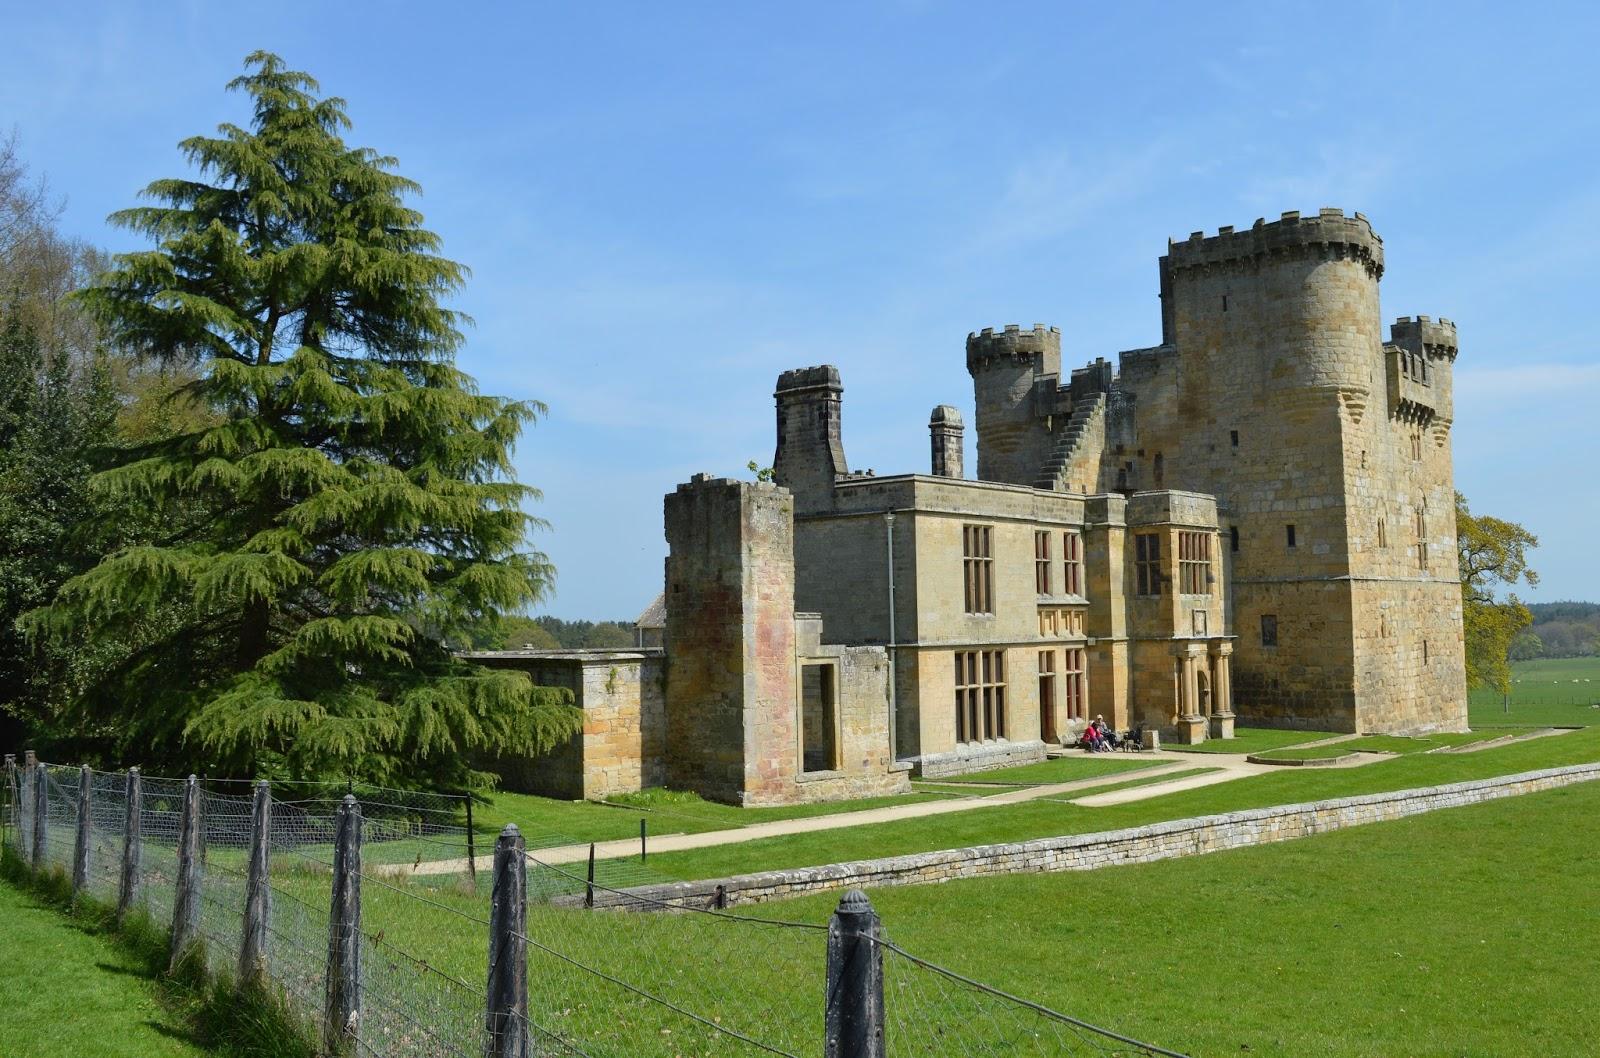 Belsay Hall & Castle - A Springtime Garden Walk